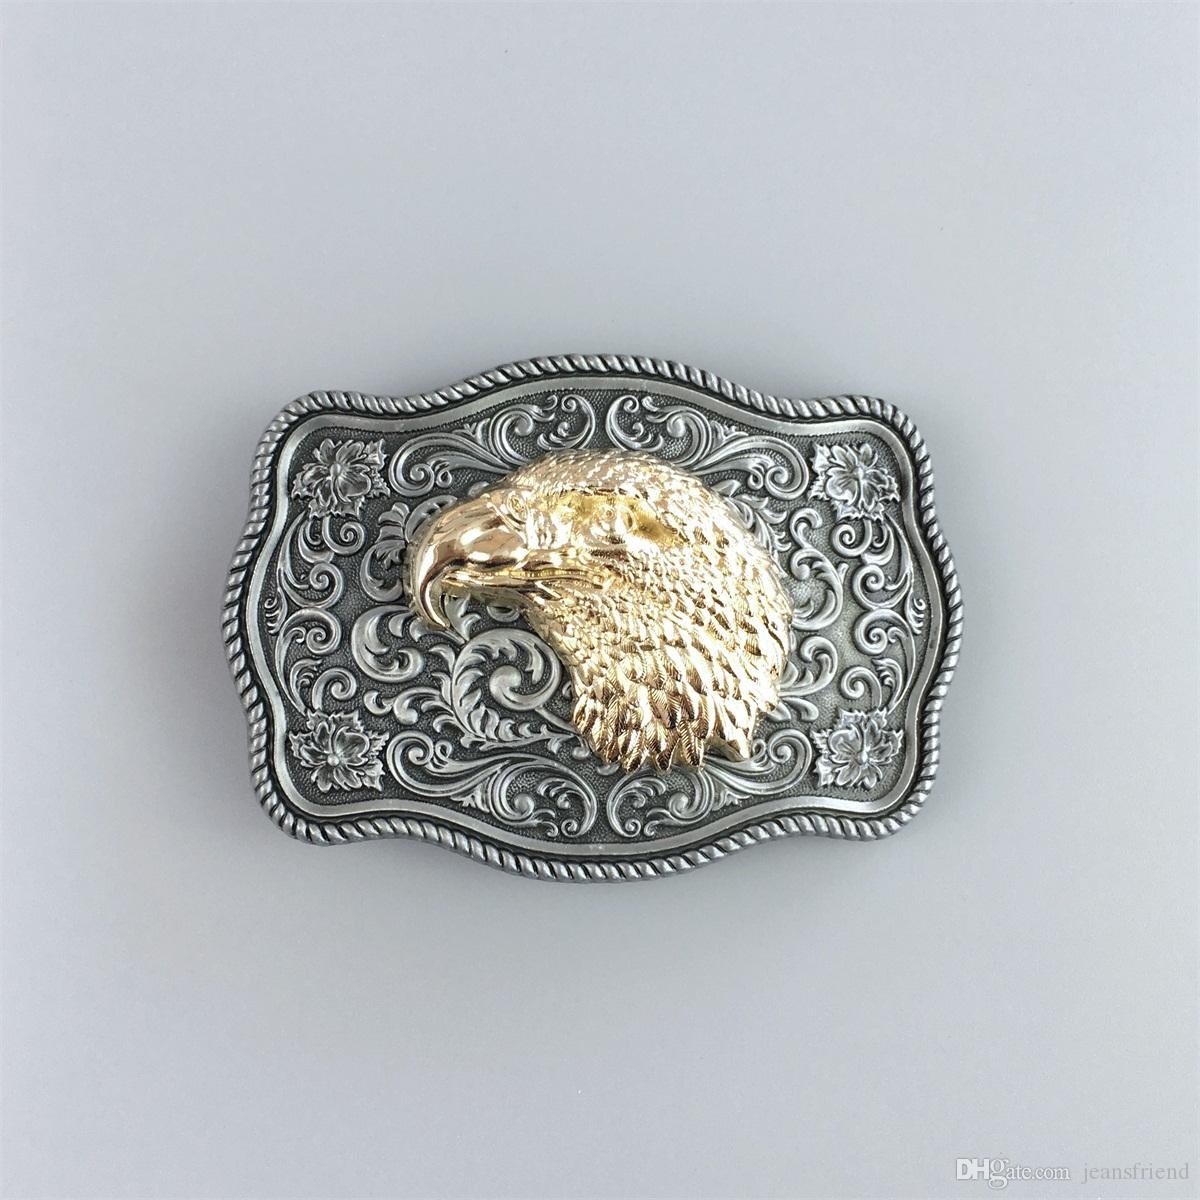 Small Size Vintage Original Eagle Head Western Belt Buckle Gurtelschnalle Boucle de ceinture